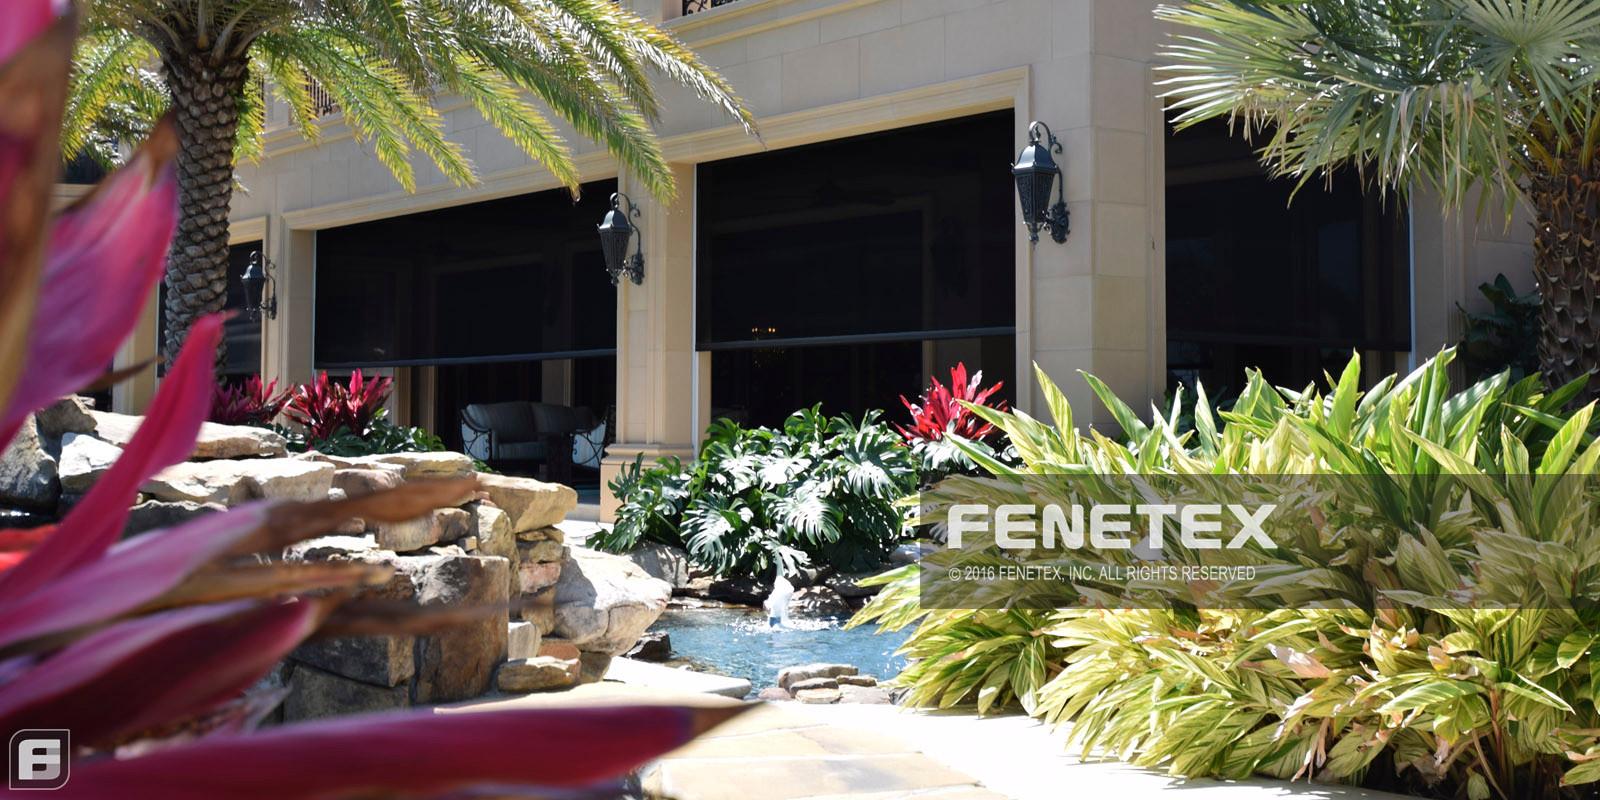 Fenetex hurricane screen